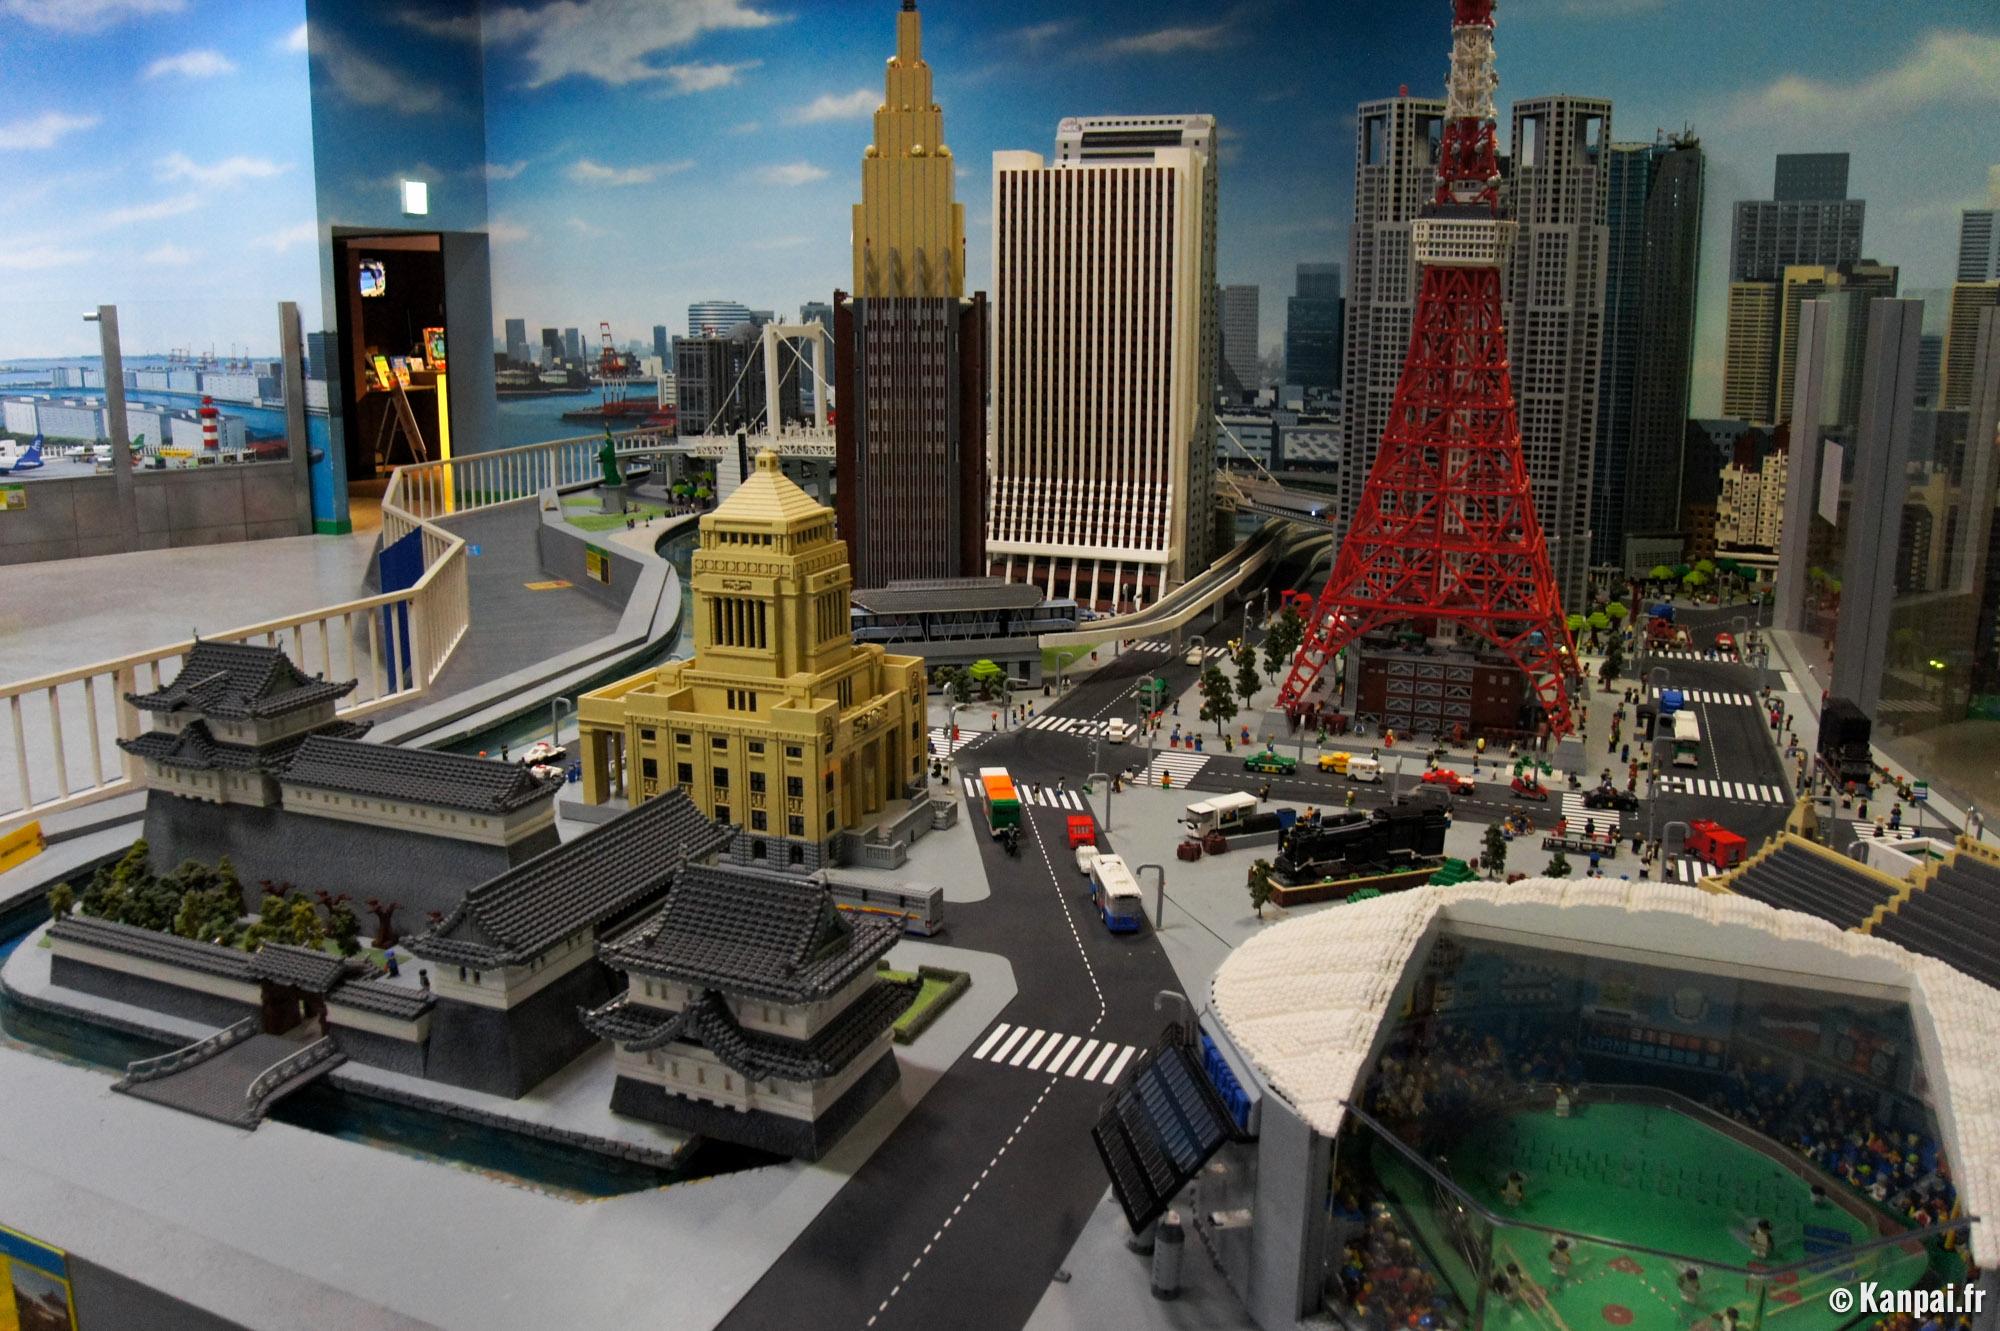 legoland le parc d 39 attractions lego tokyo. Black Bedroom Furniture Sets. Home Design Ideas